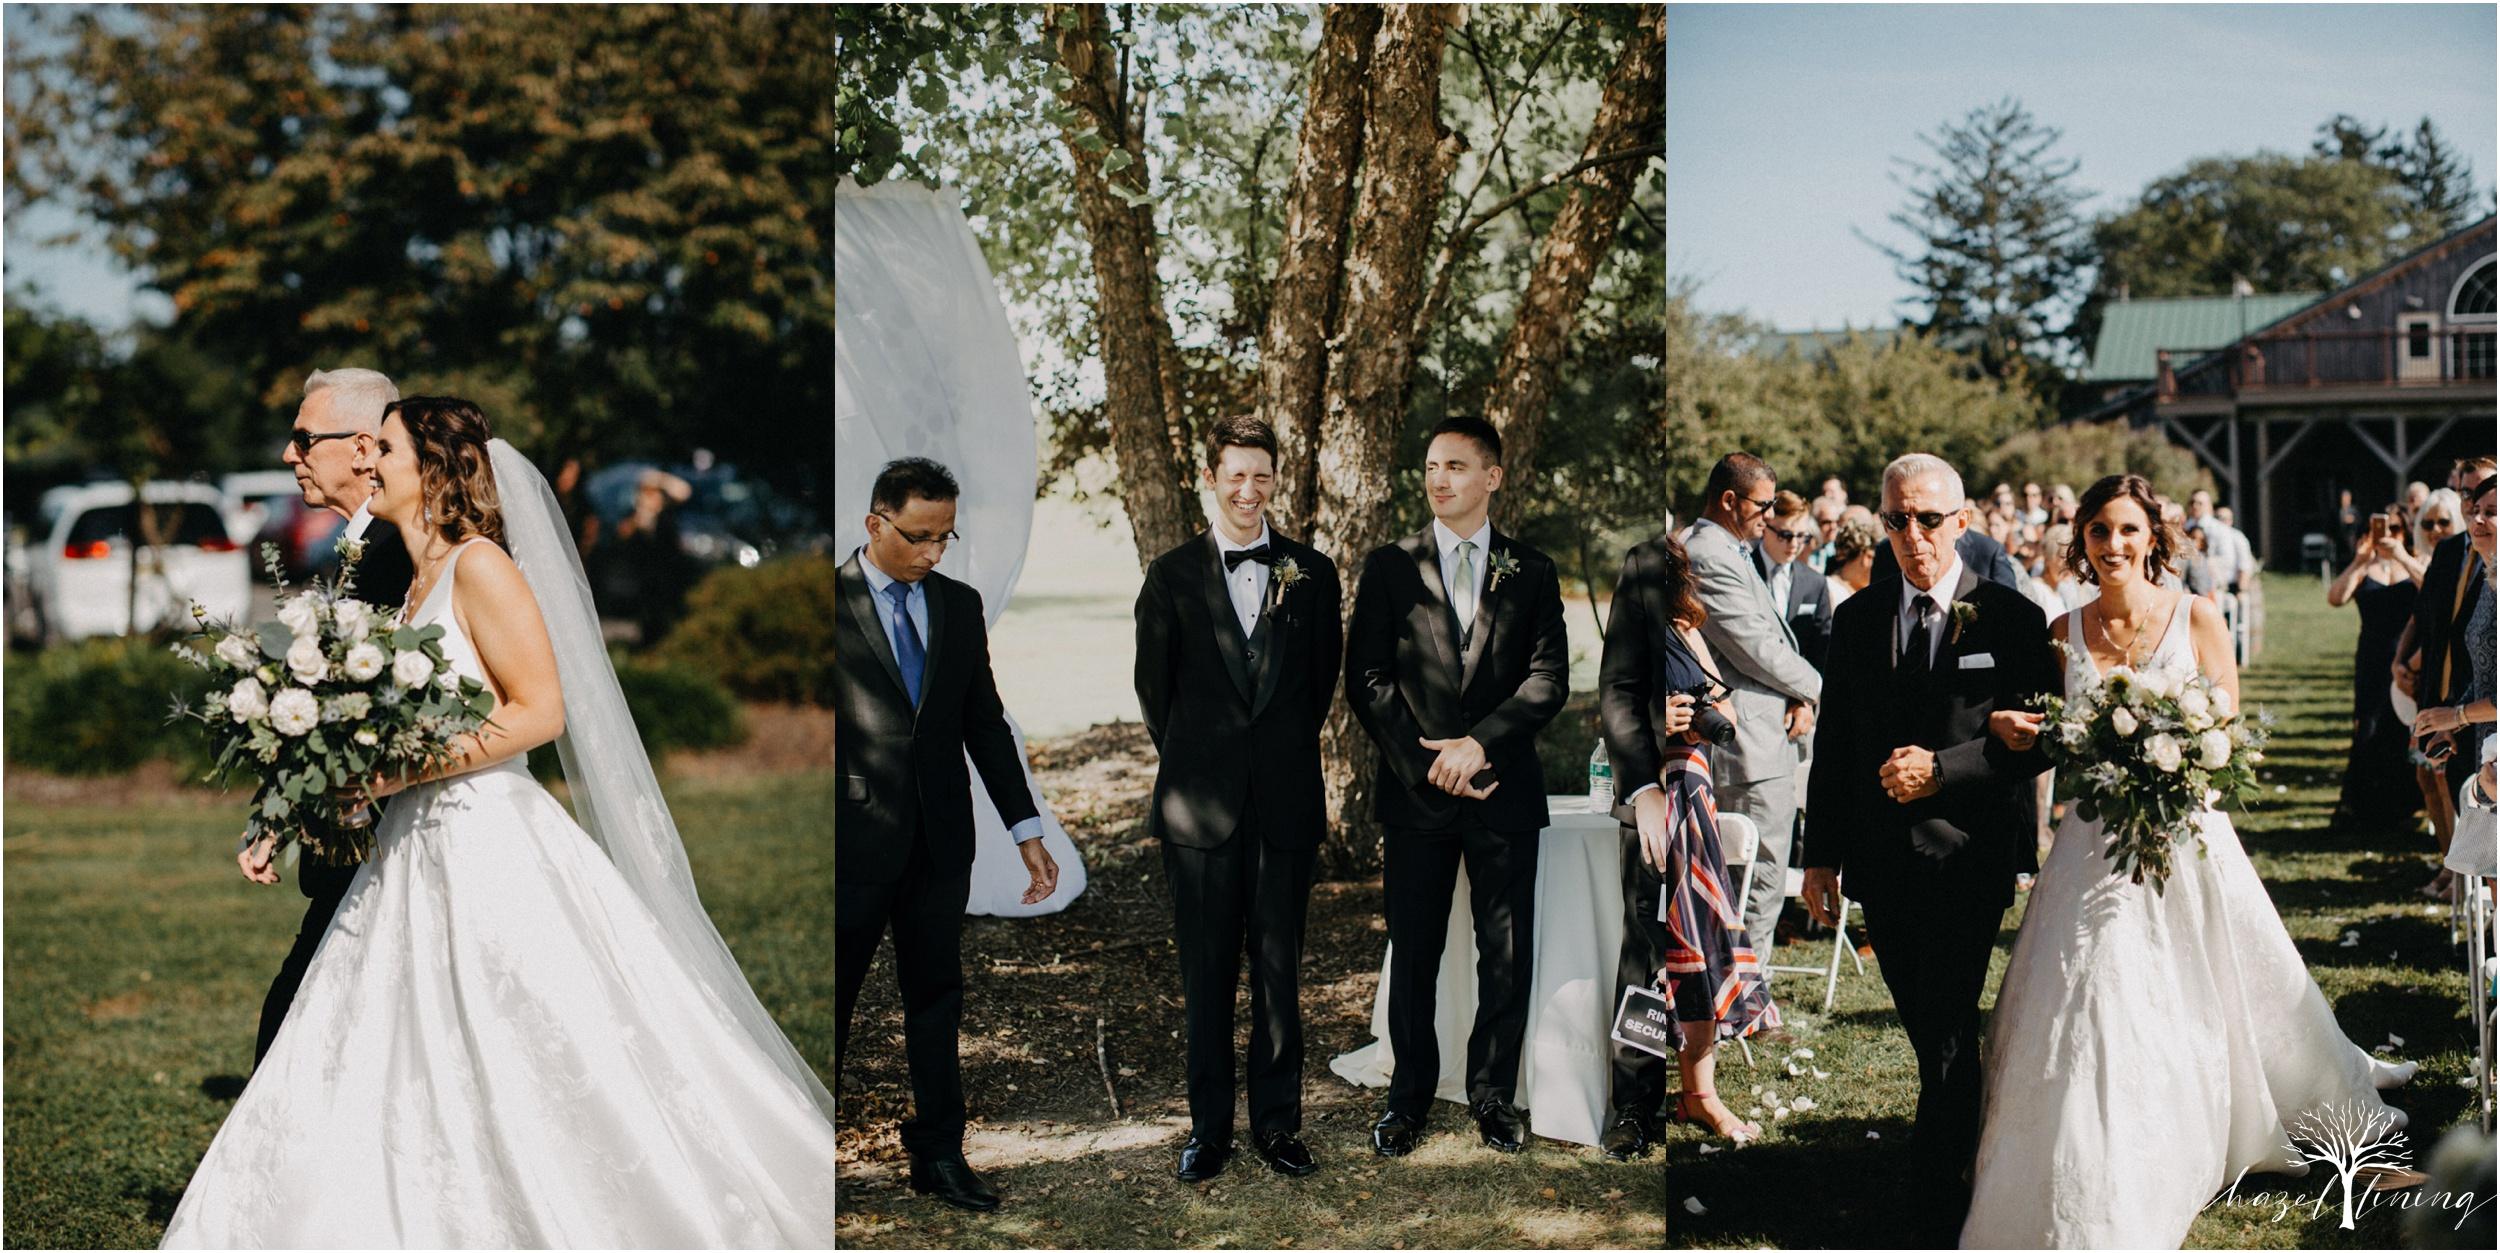 maureen-hepner-anthony-giordano-rose-bank-winery-newtow-pennsylvania-luxury-summer-wedding-hazel-lining-photography-destination-elopement-wedding-engagement-photography_0062.jpg